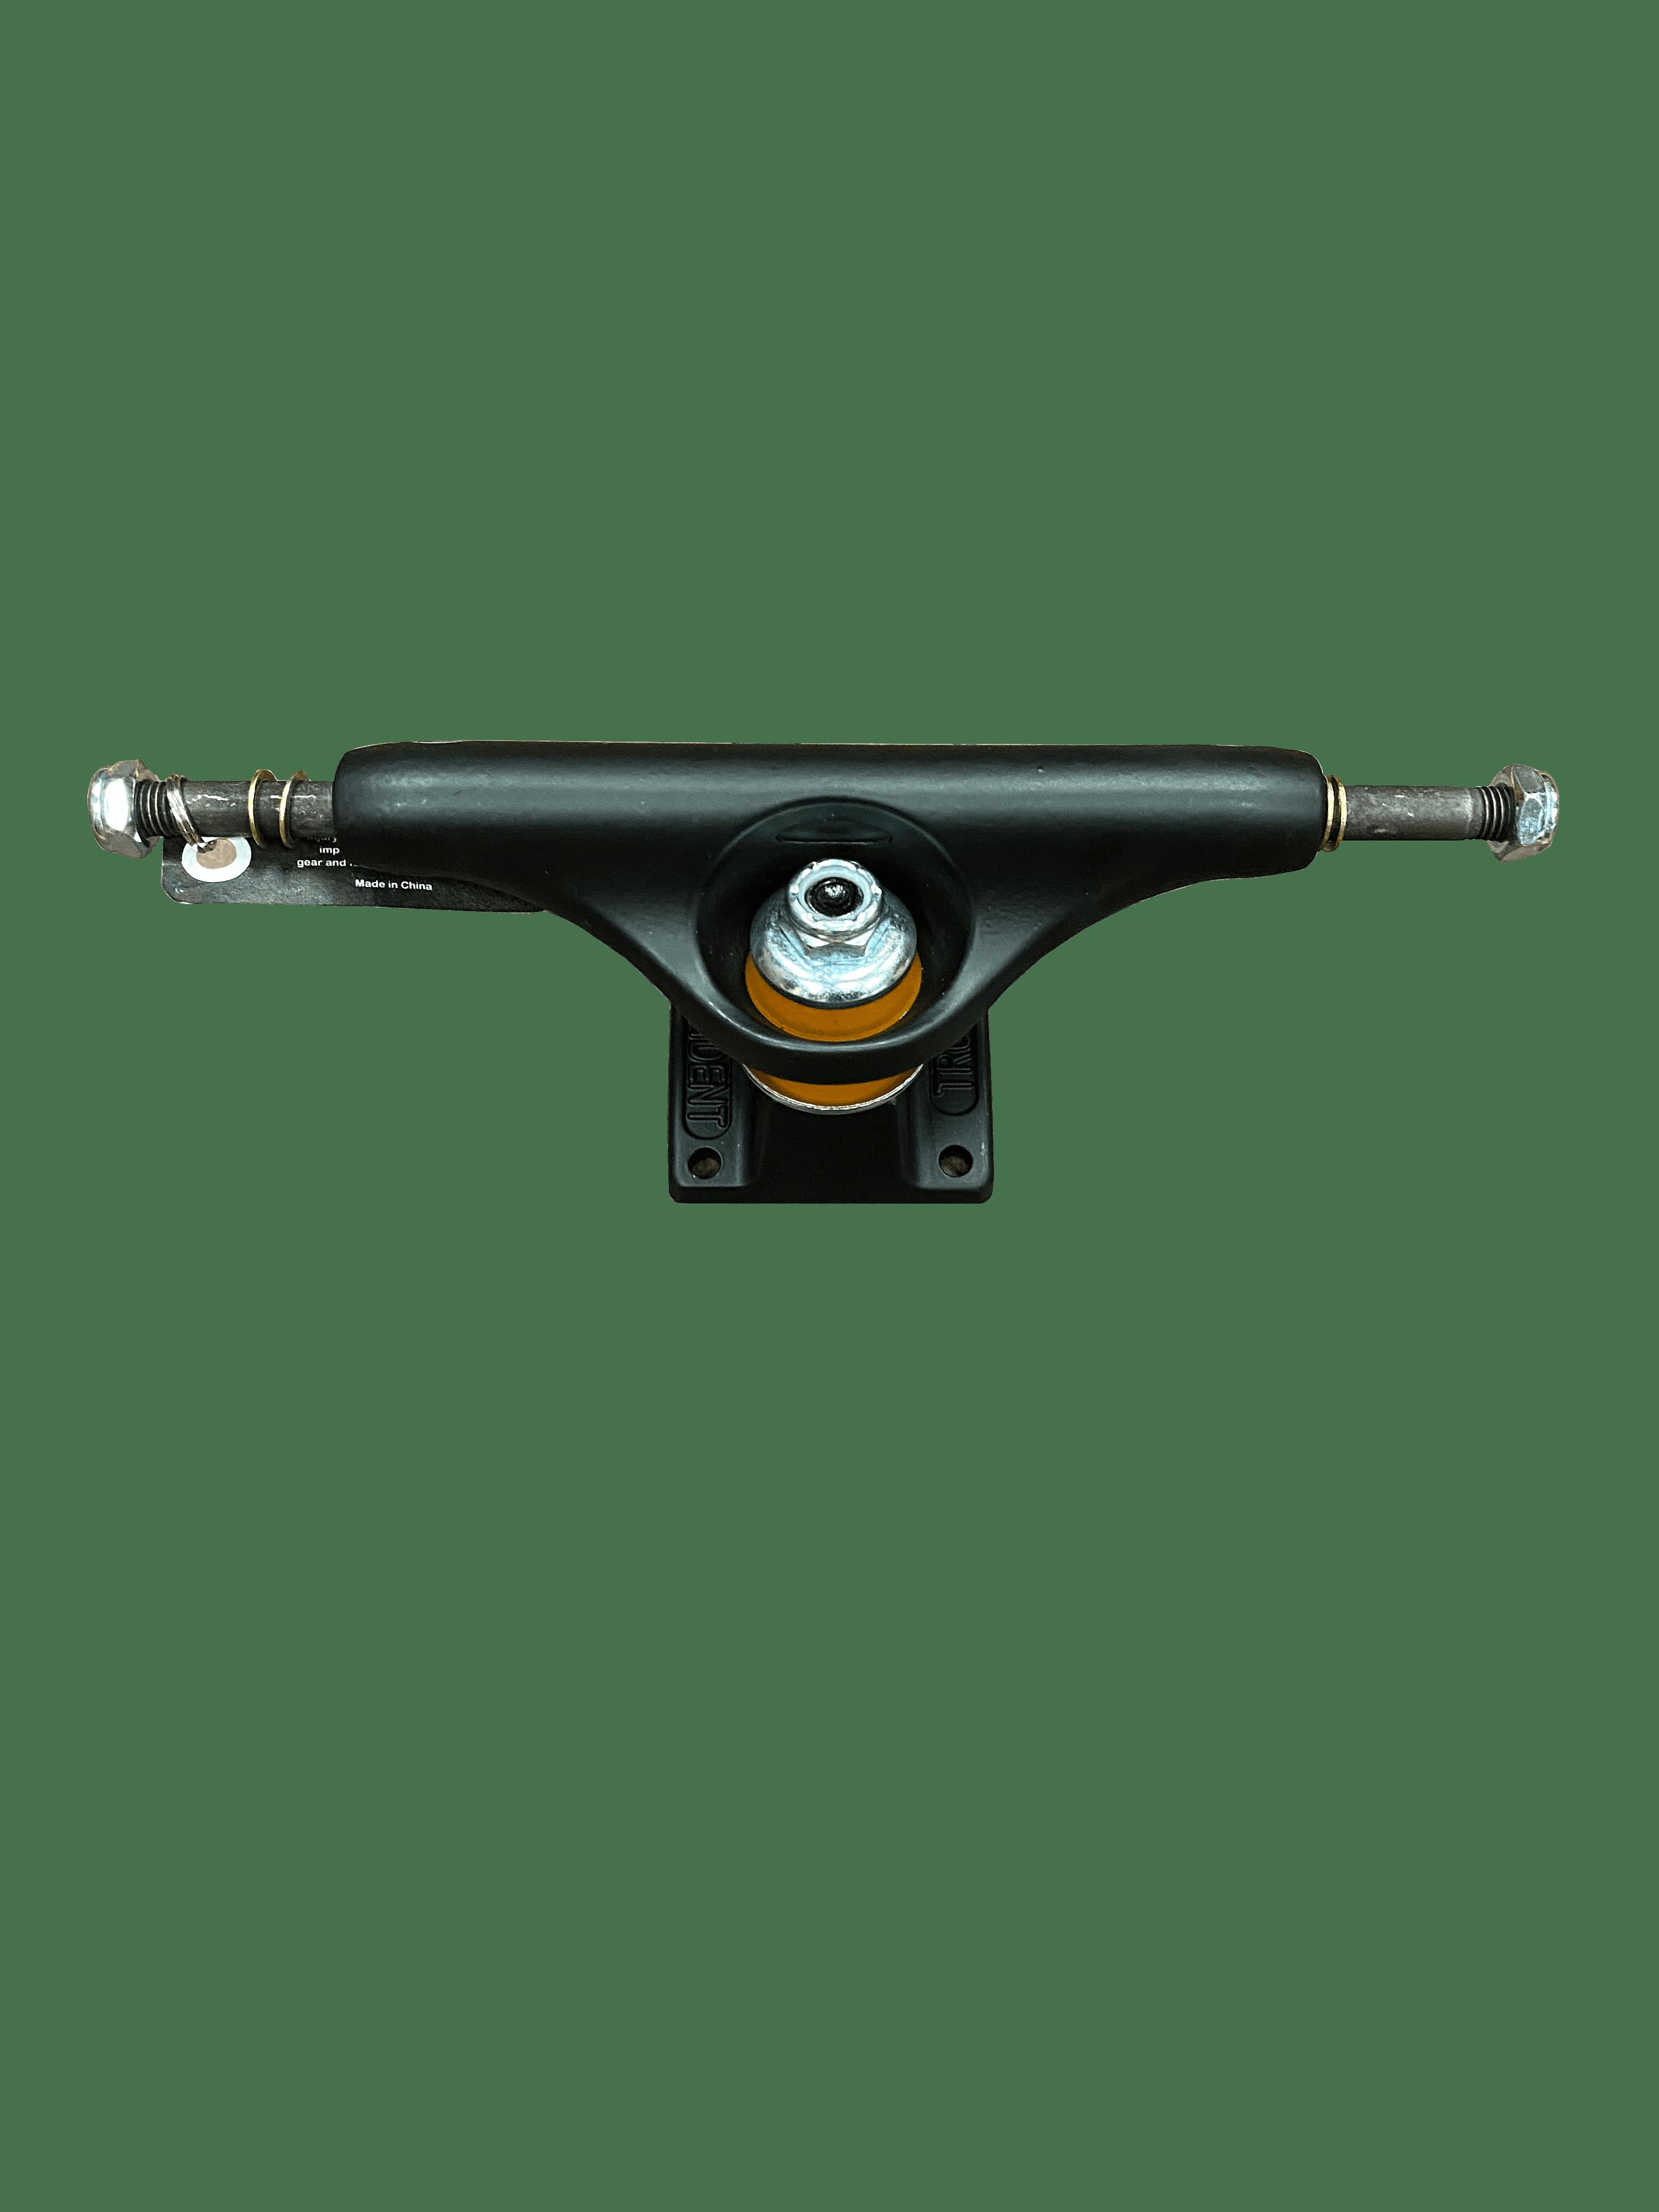 indy-dual-cross-4602-139-24